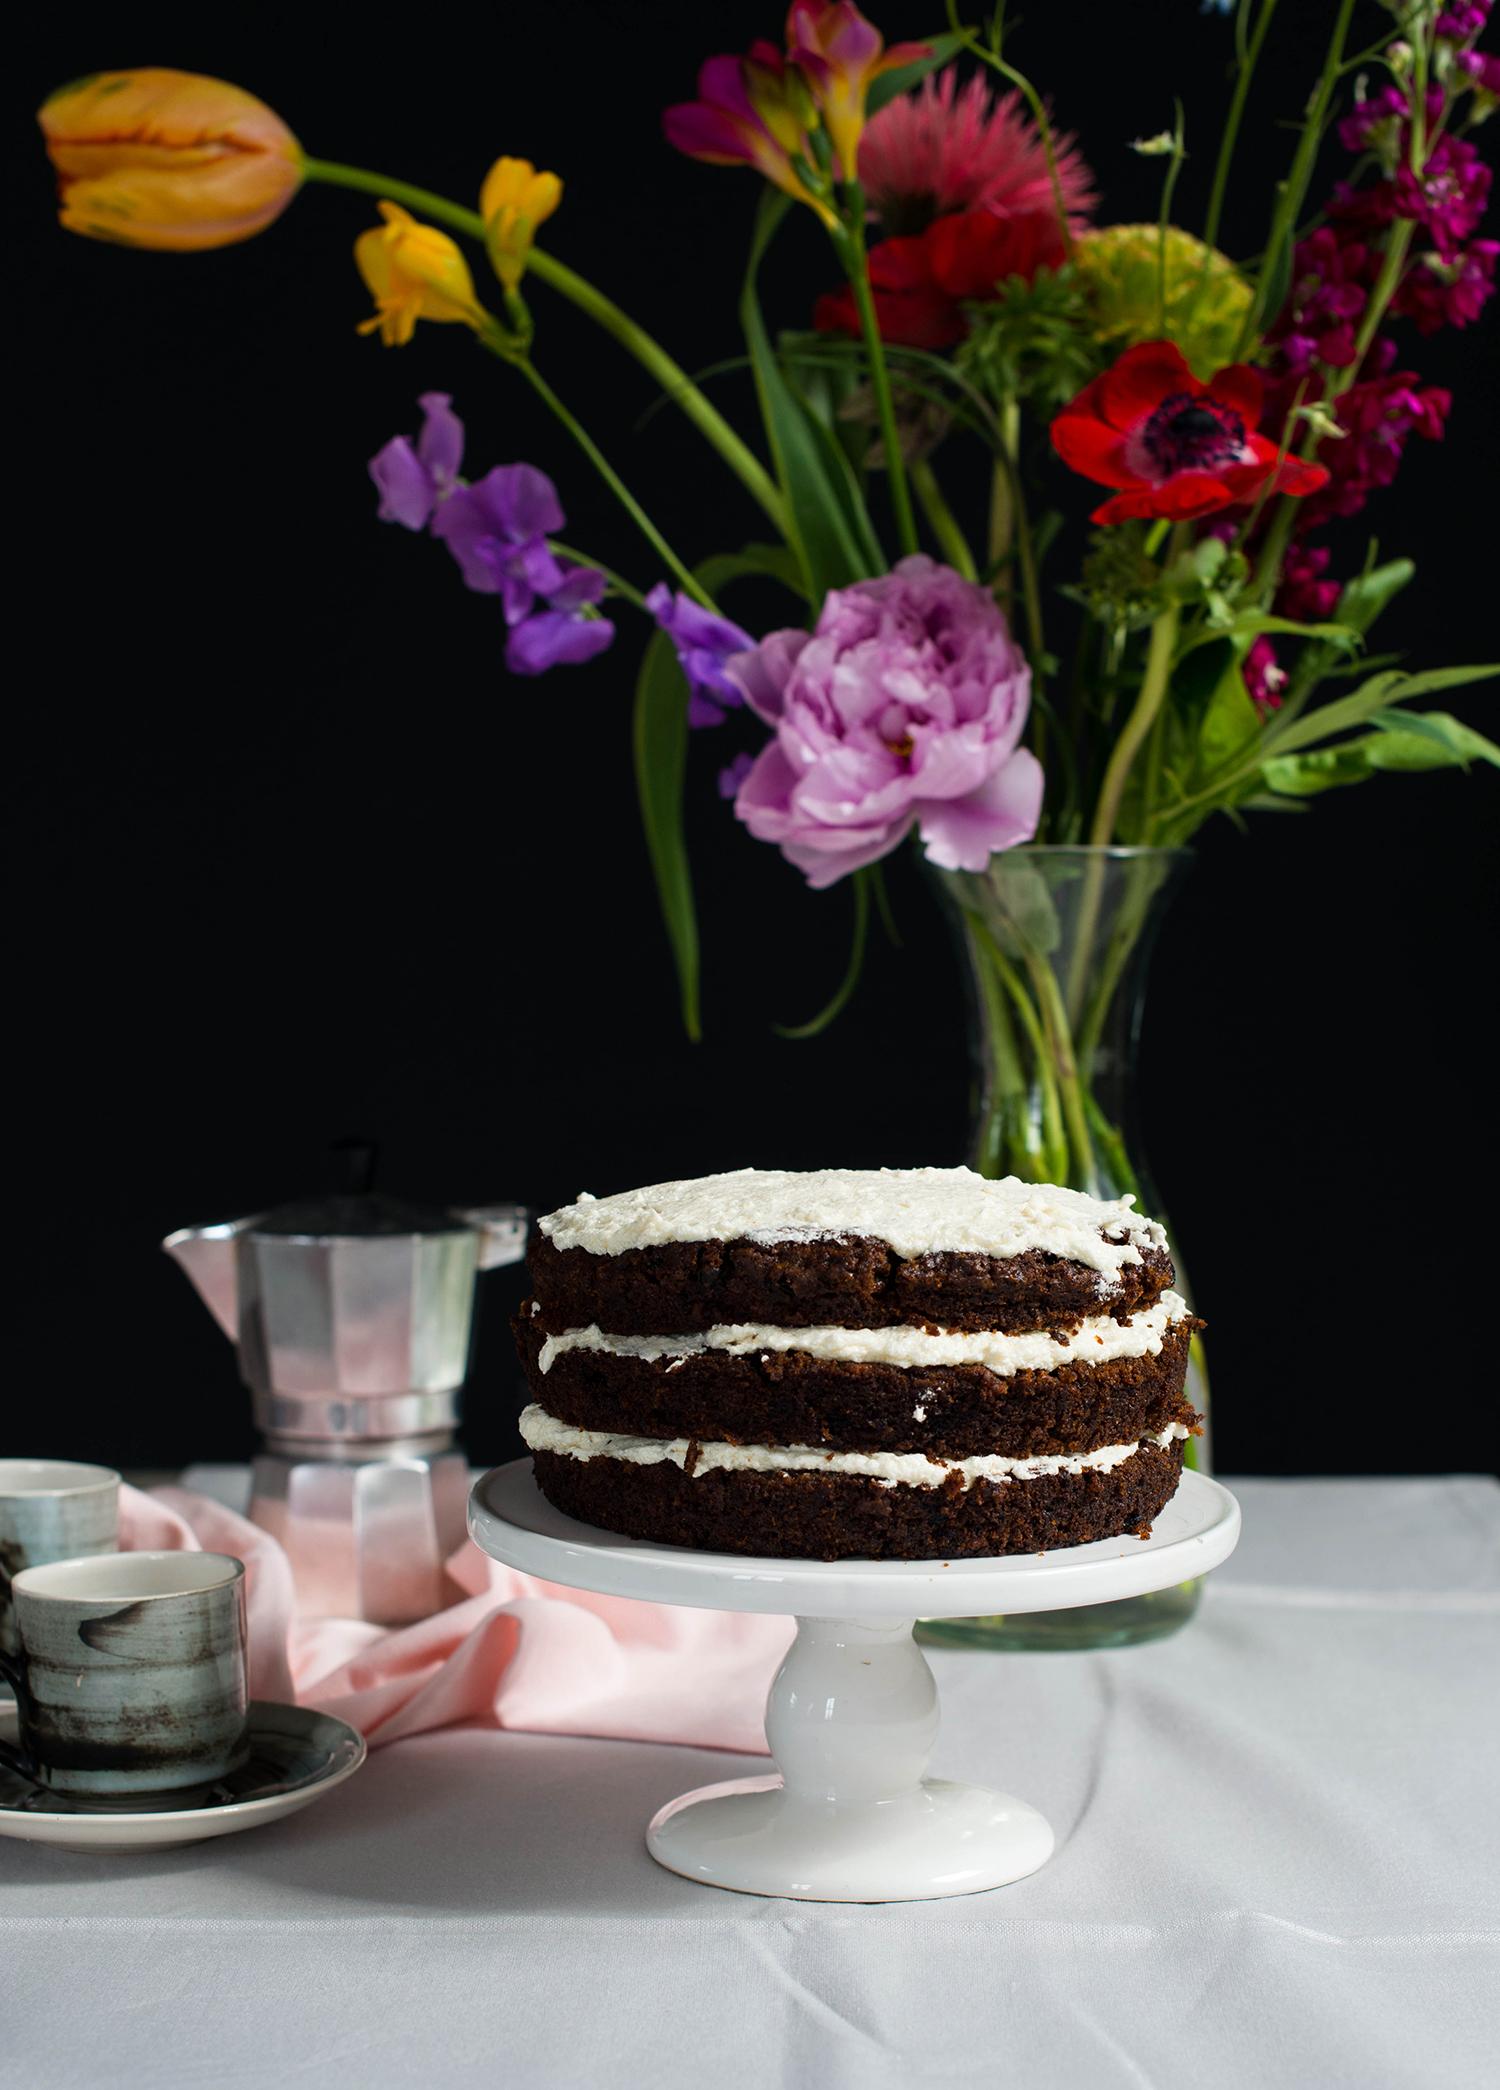 Vegan-carrot-cake-lea-lou-7